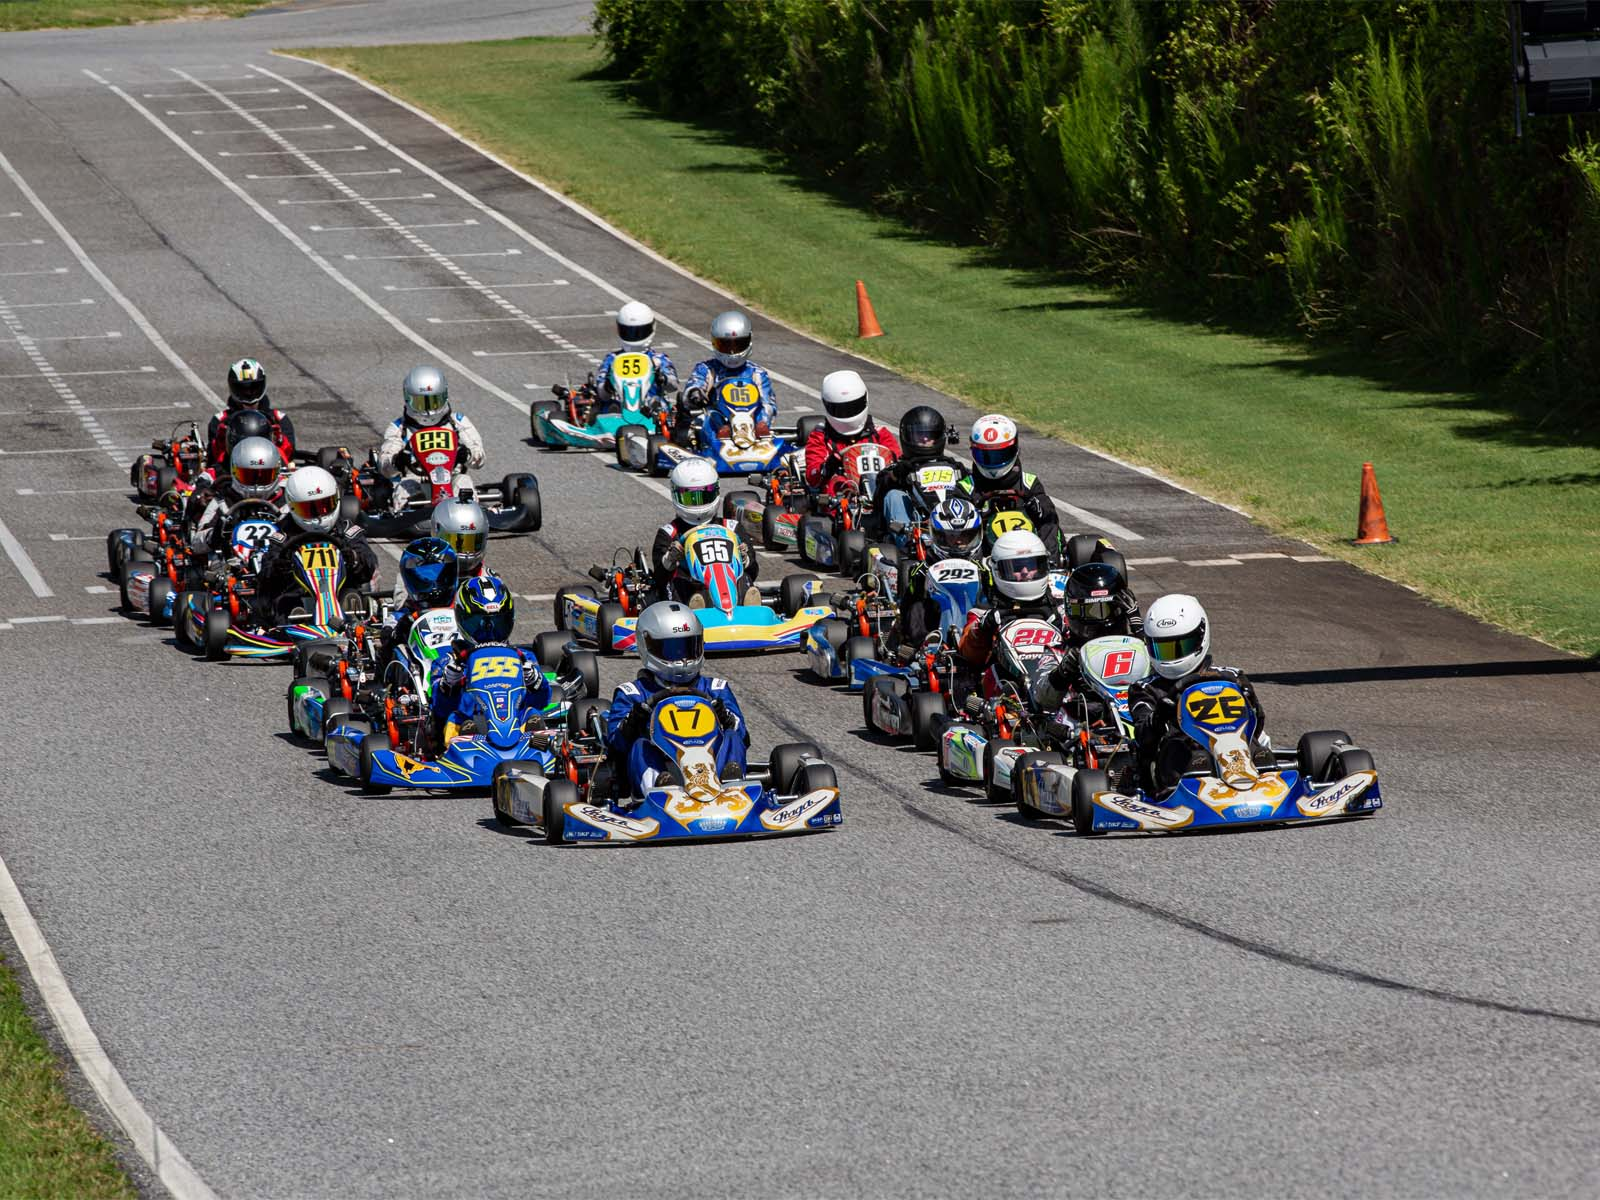 kart raceday - Member Racing